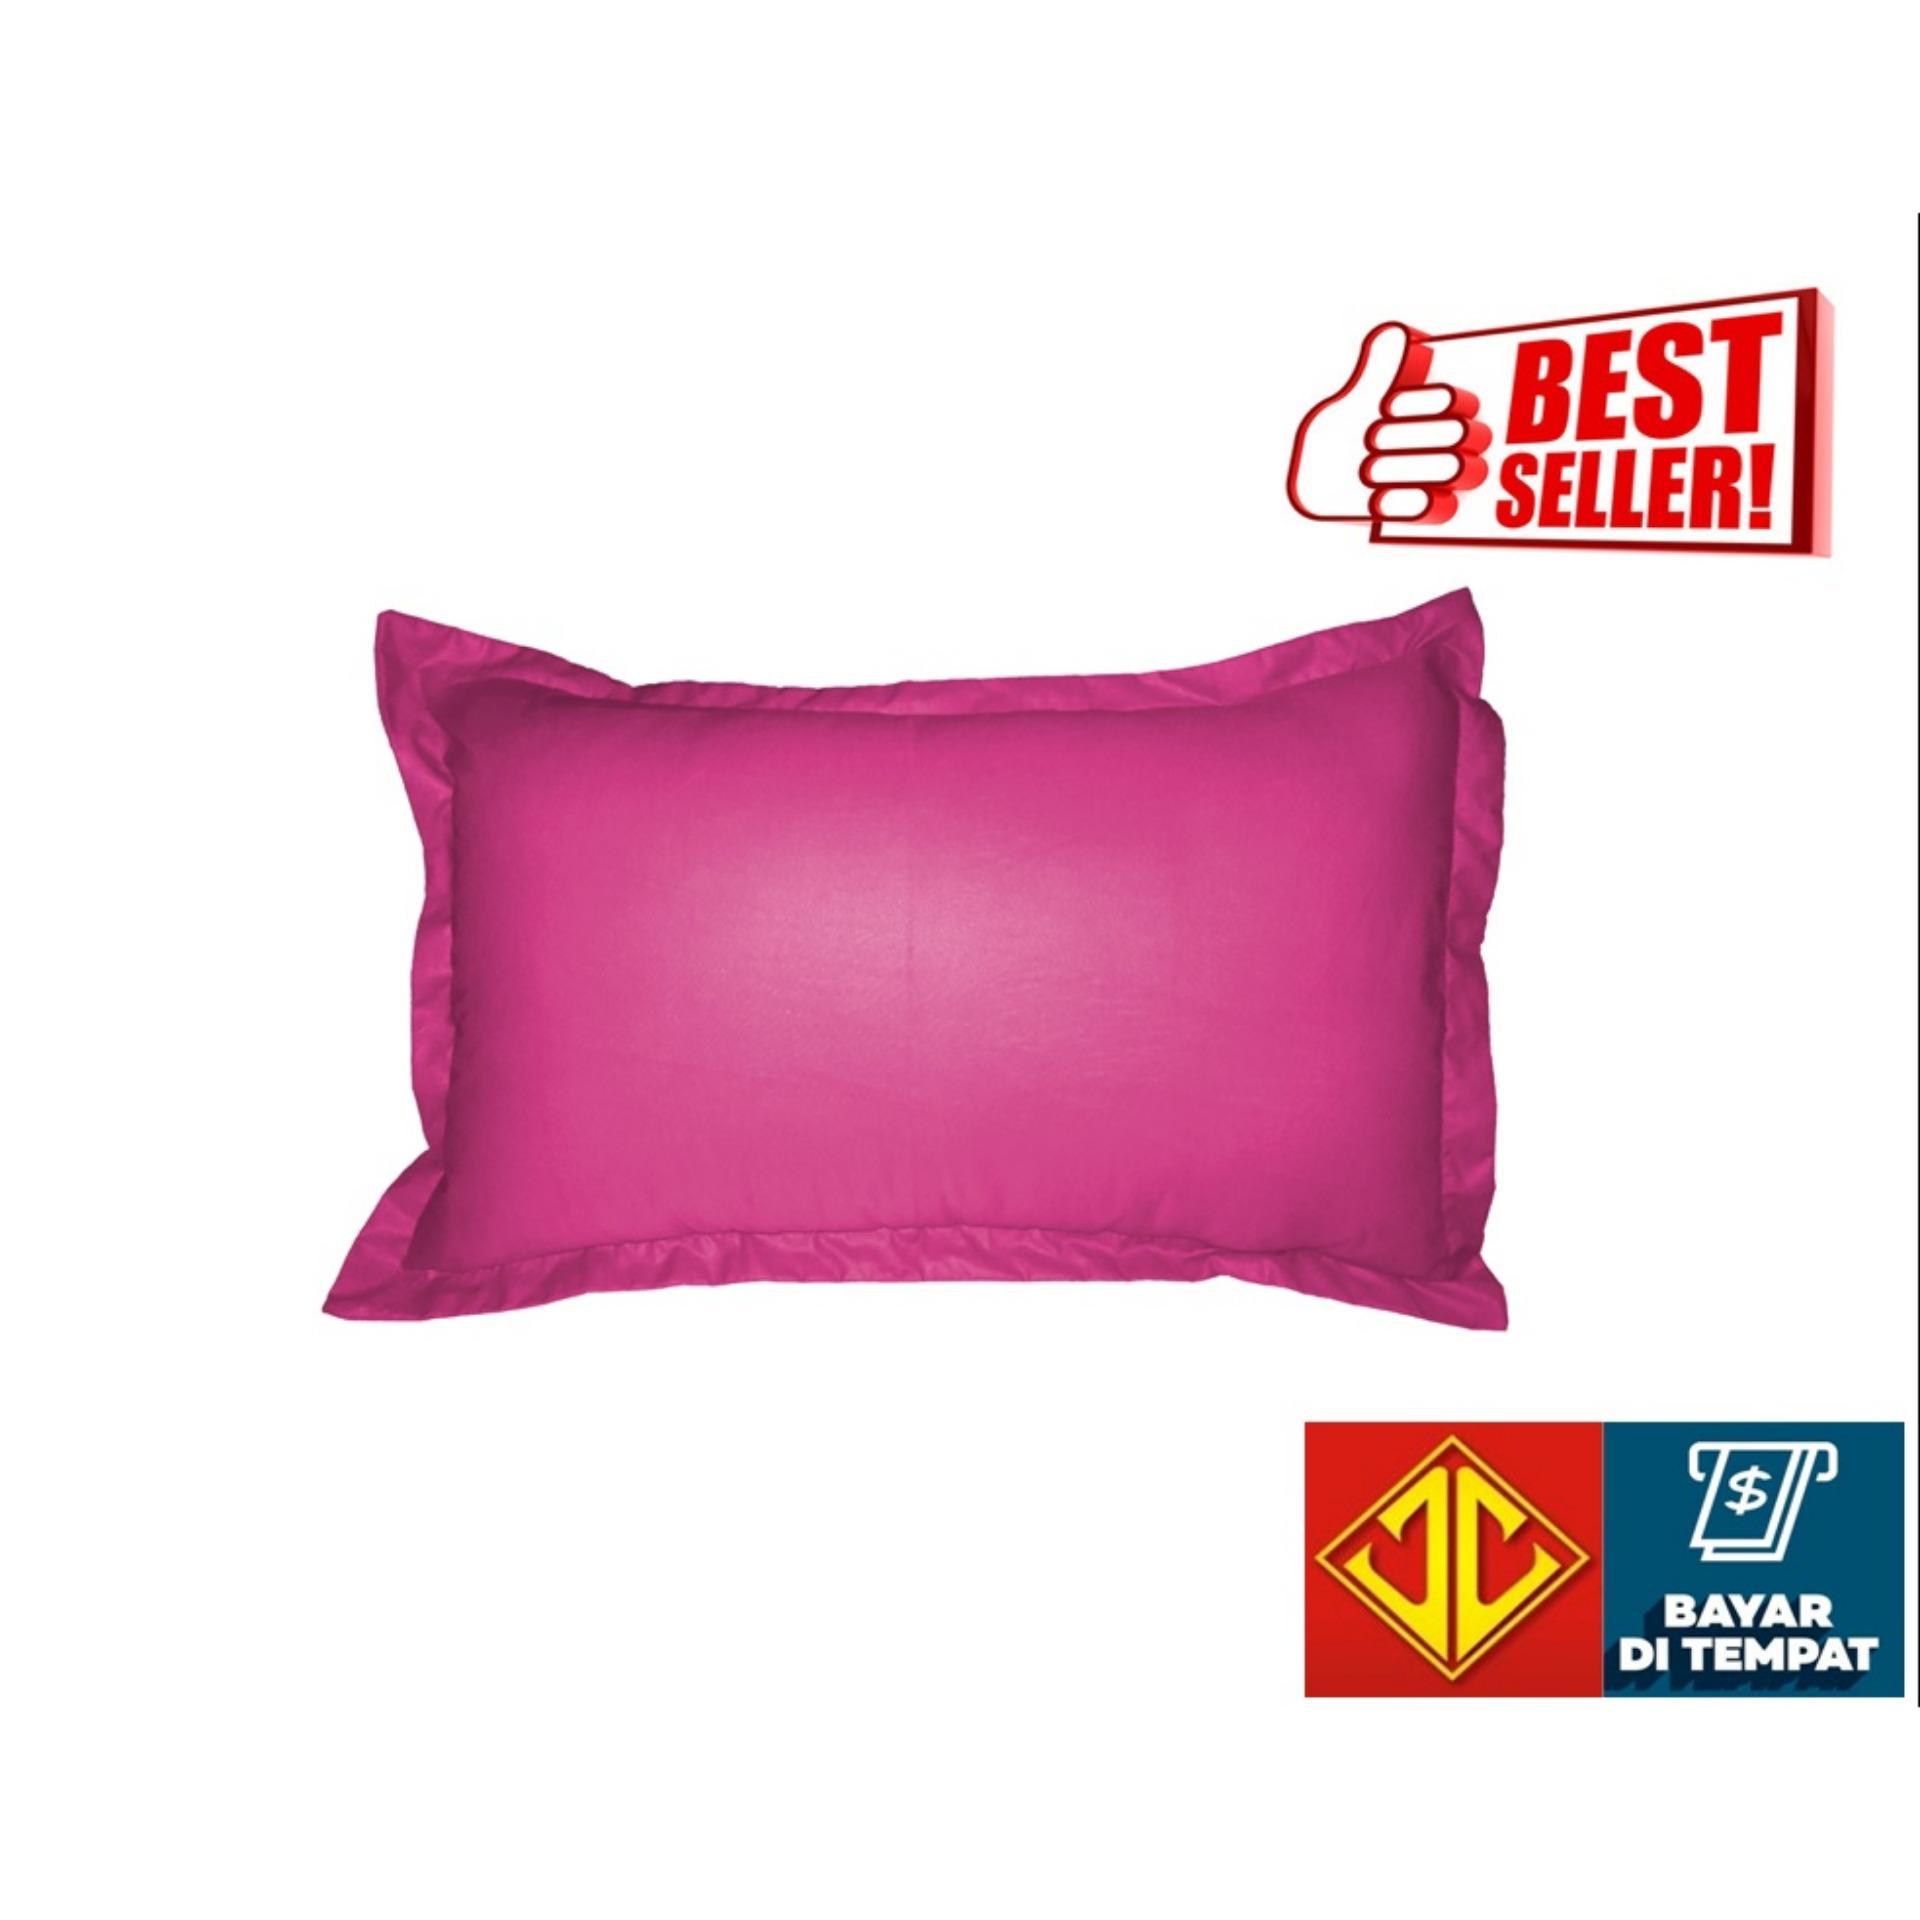 Buy Sell Cheapest Promosprei Anti Ompol Best Quality Product Deals Perlak Atau Alas Motif Sarung Bantal Waterproof Air Sarban Polos Aneka Warna